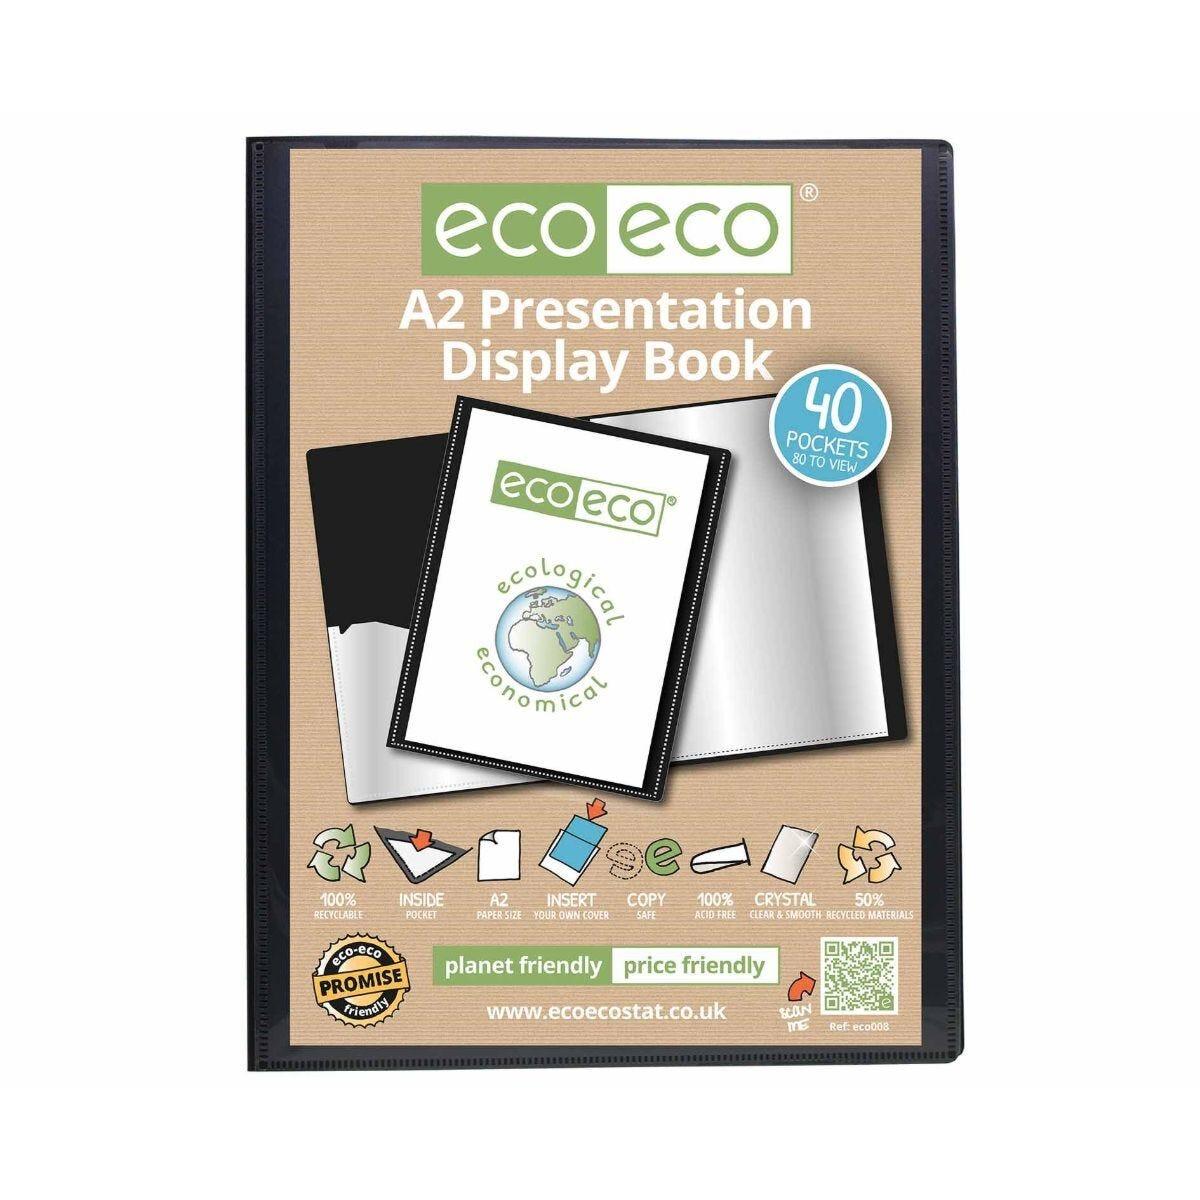 eco eco Presentation Display Book 40 Pocket A2 Black